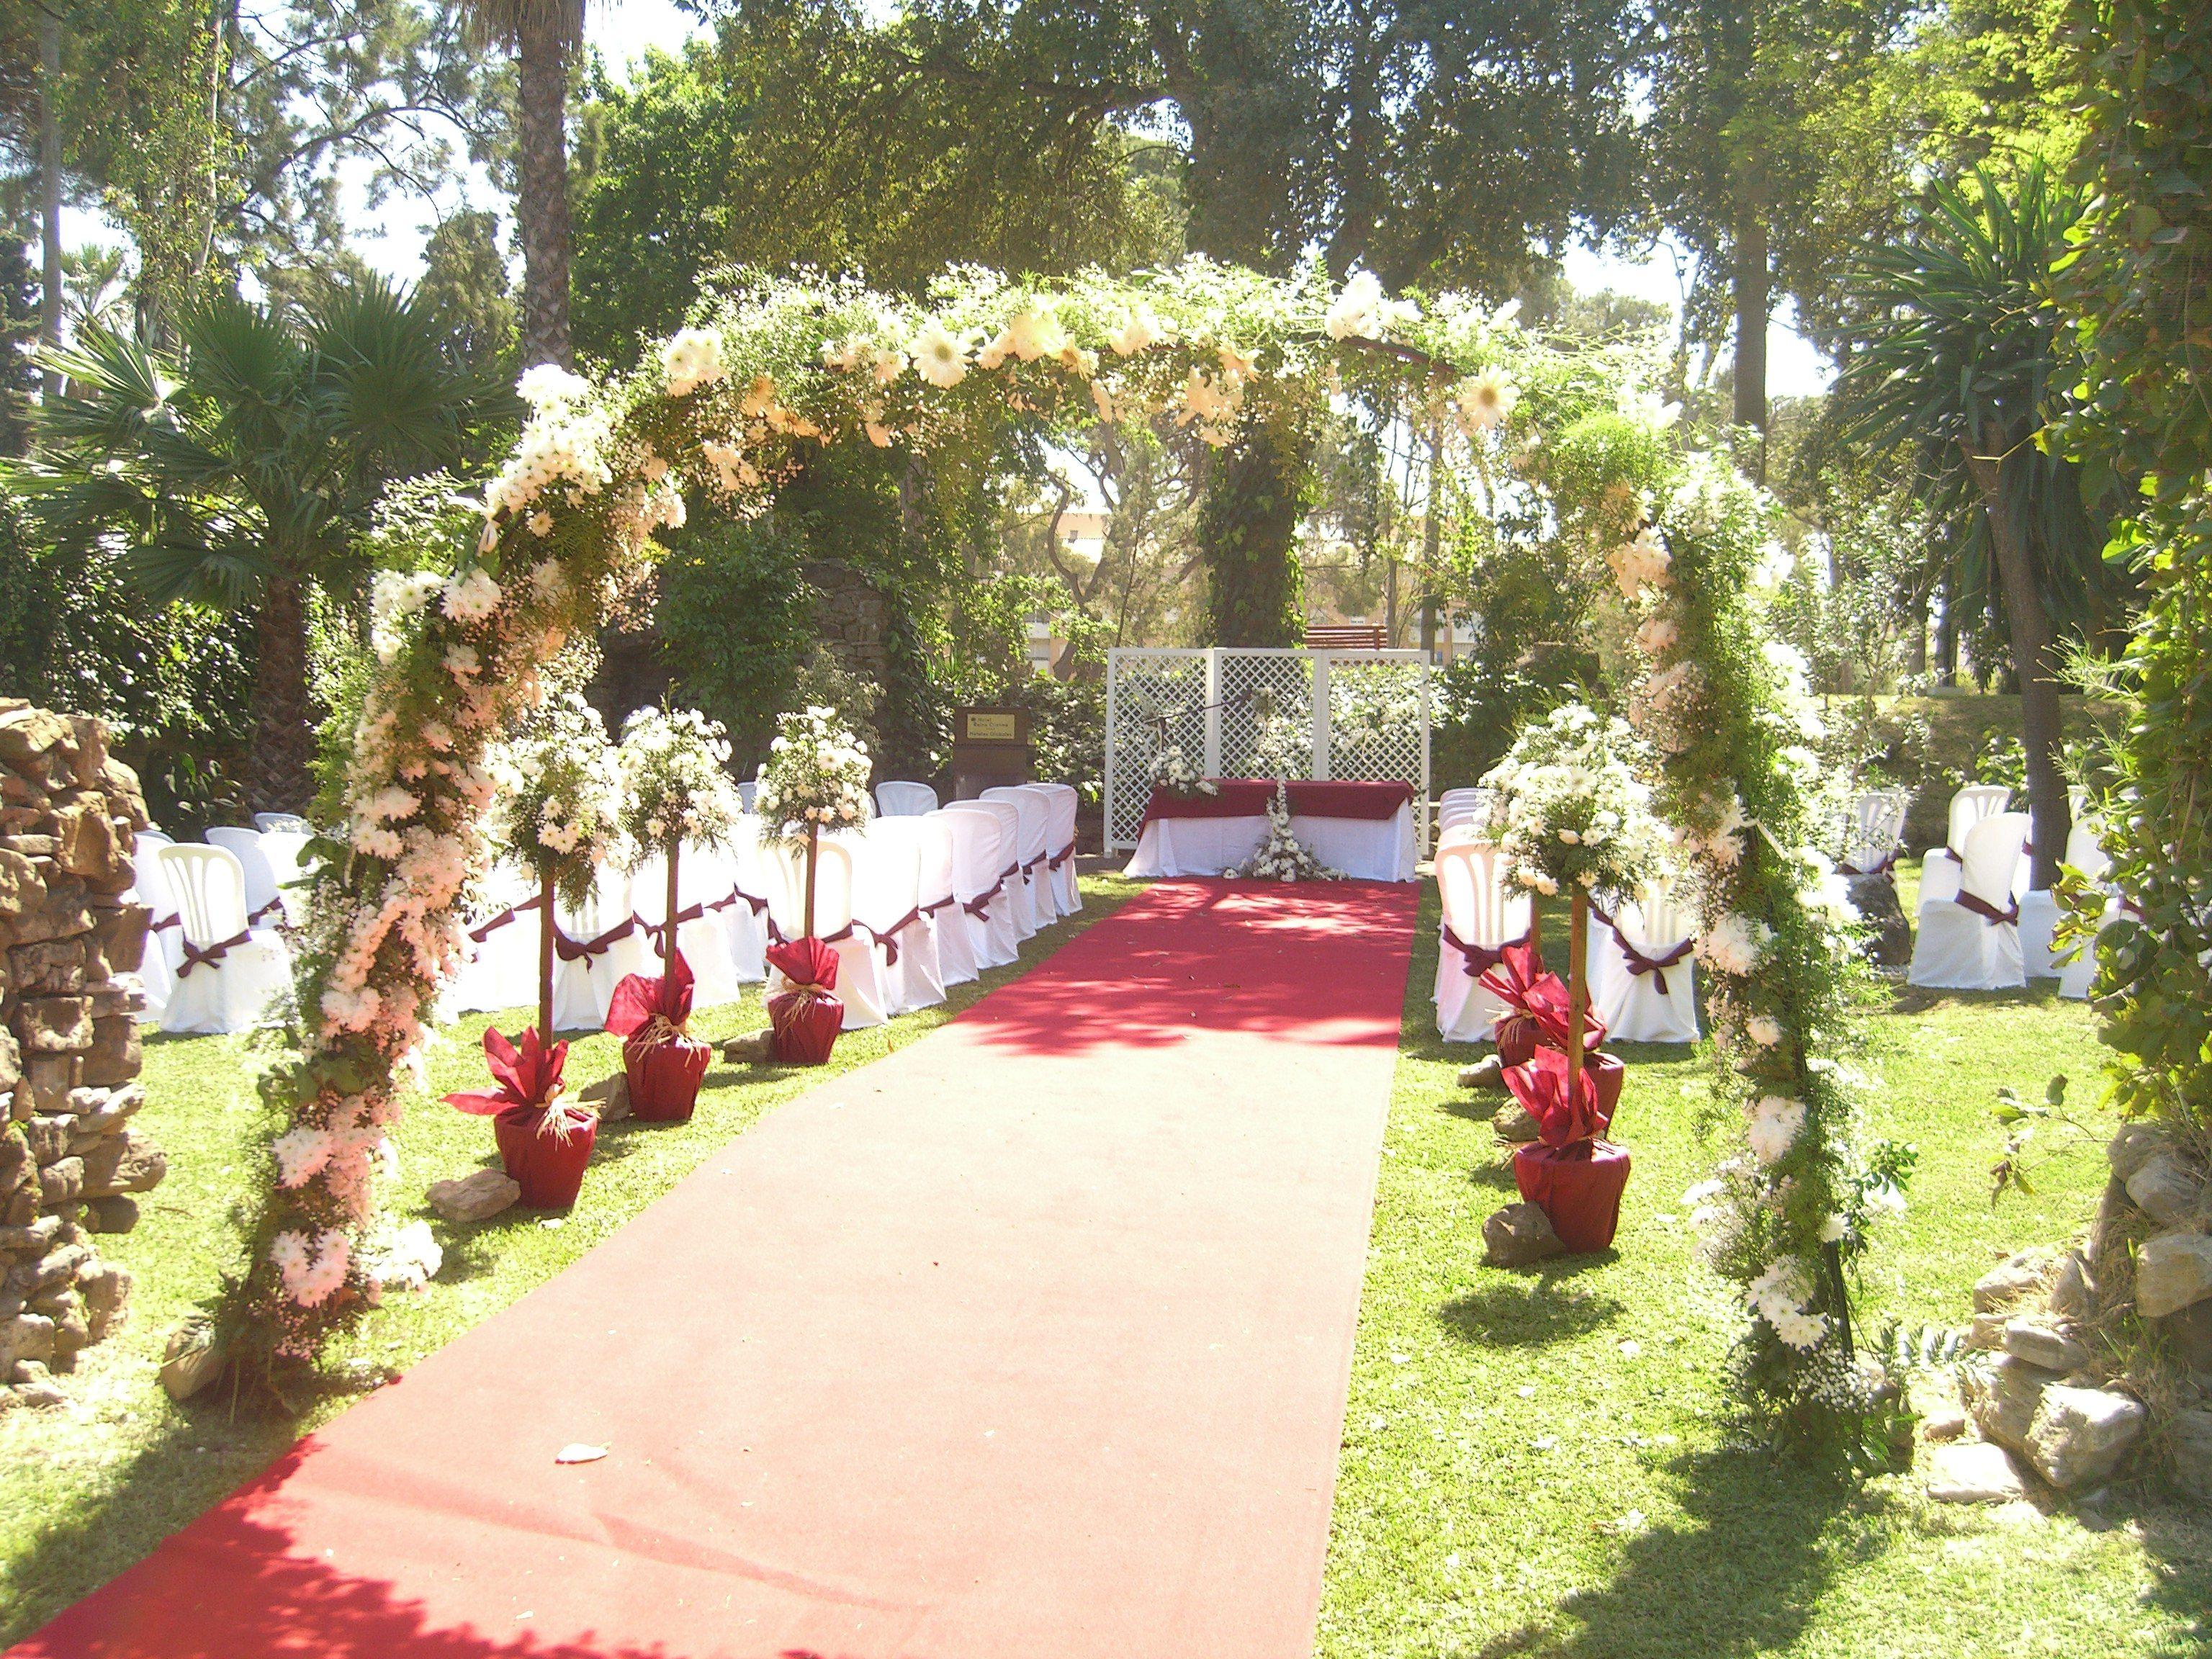 Arreglo jardines exteriores finest with arreglo jardines for Arreglo de jardines exteriores